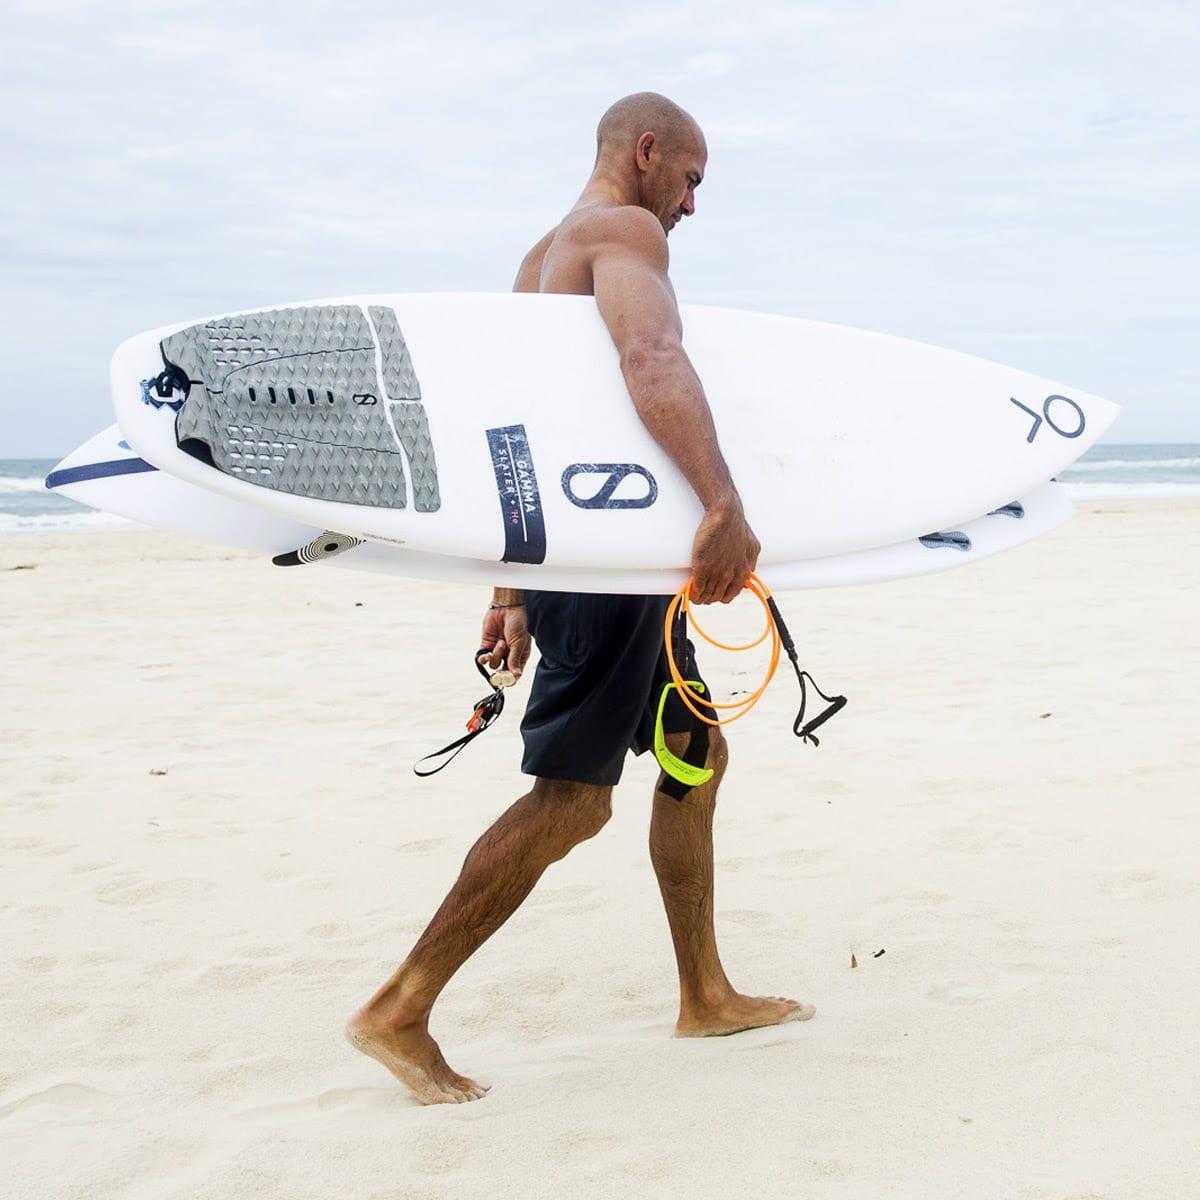 Slater Designs Surfboard Helium Gamma on the beach